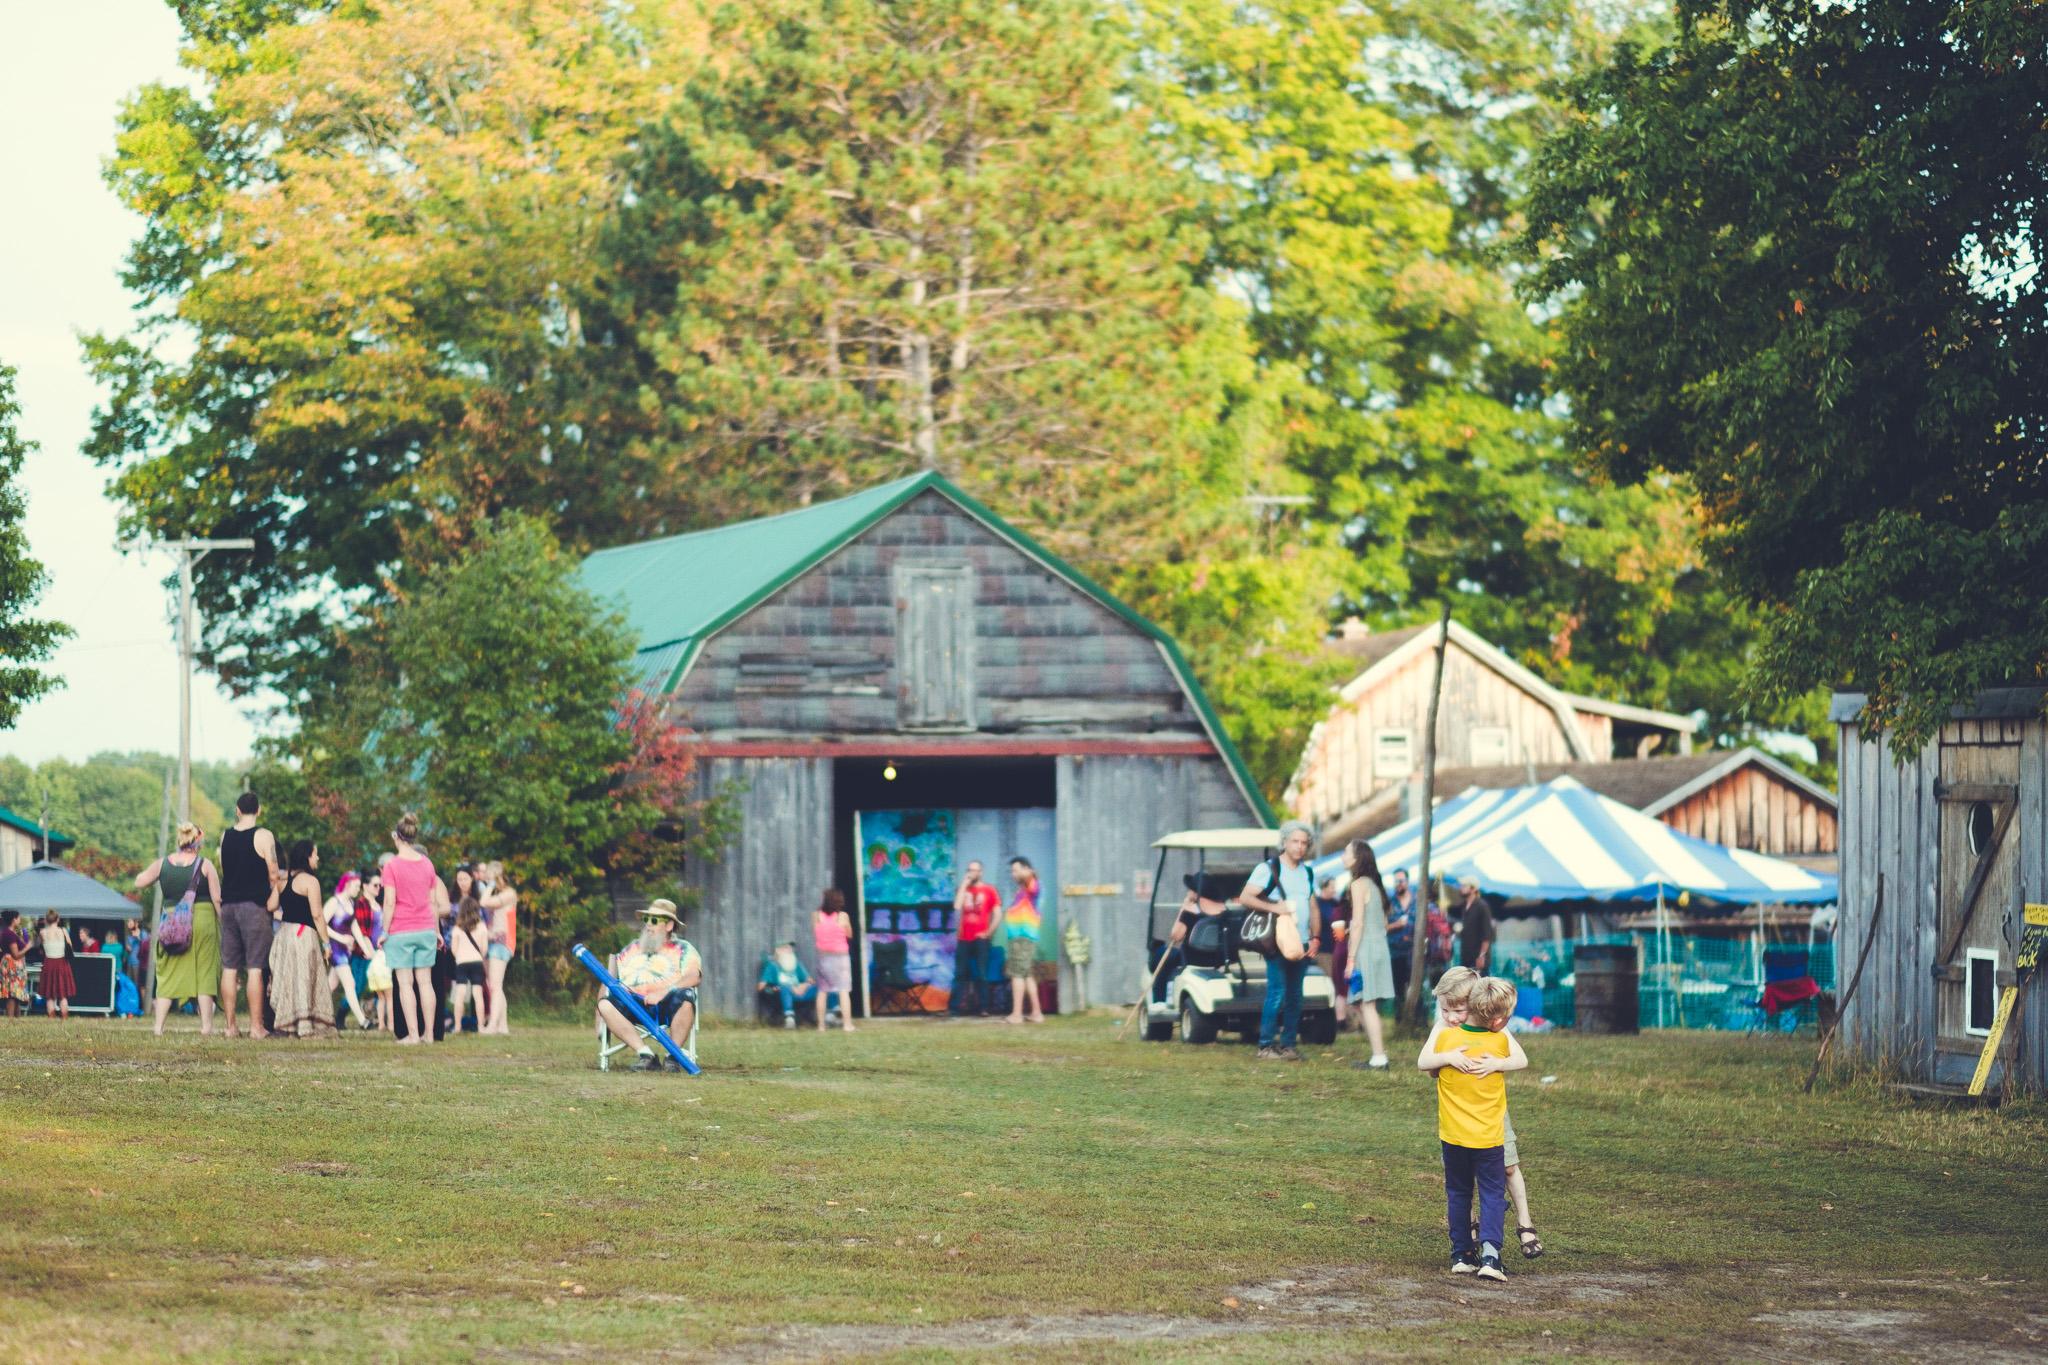 Earthwork Harvest Gathering 2017 - brockit 183322